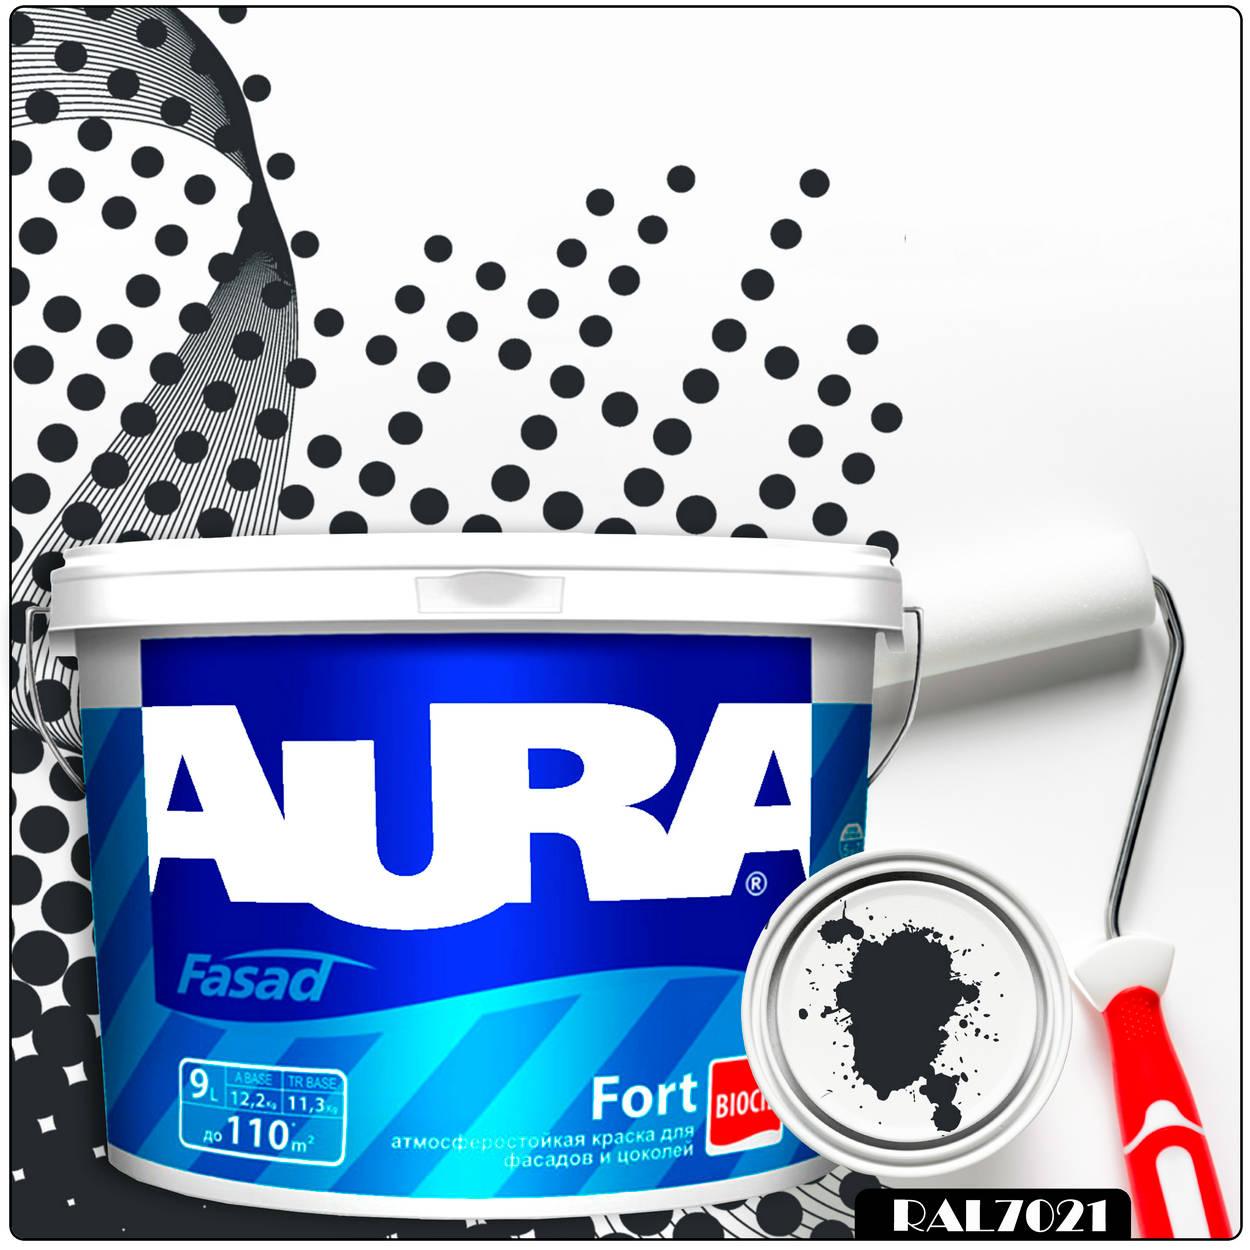 Фото 15 - Краска Aura Fasad Fort, RAL 7021 Чёрно-серый, латексная, матовая, для фасада и цоколей, 9л, Аура.